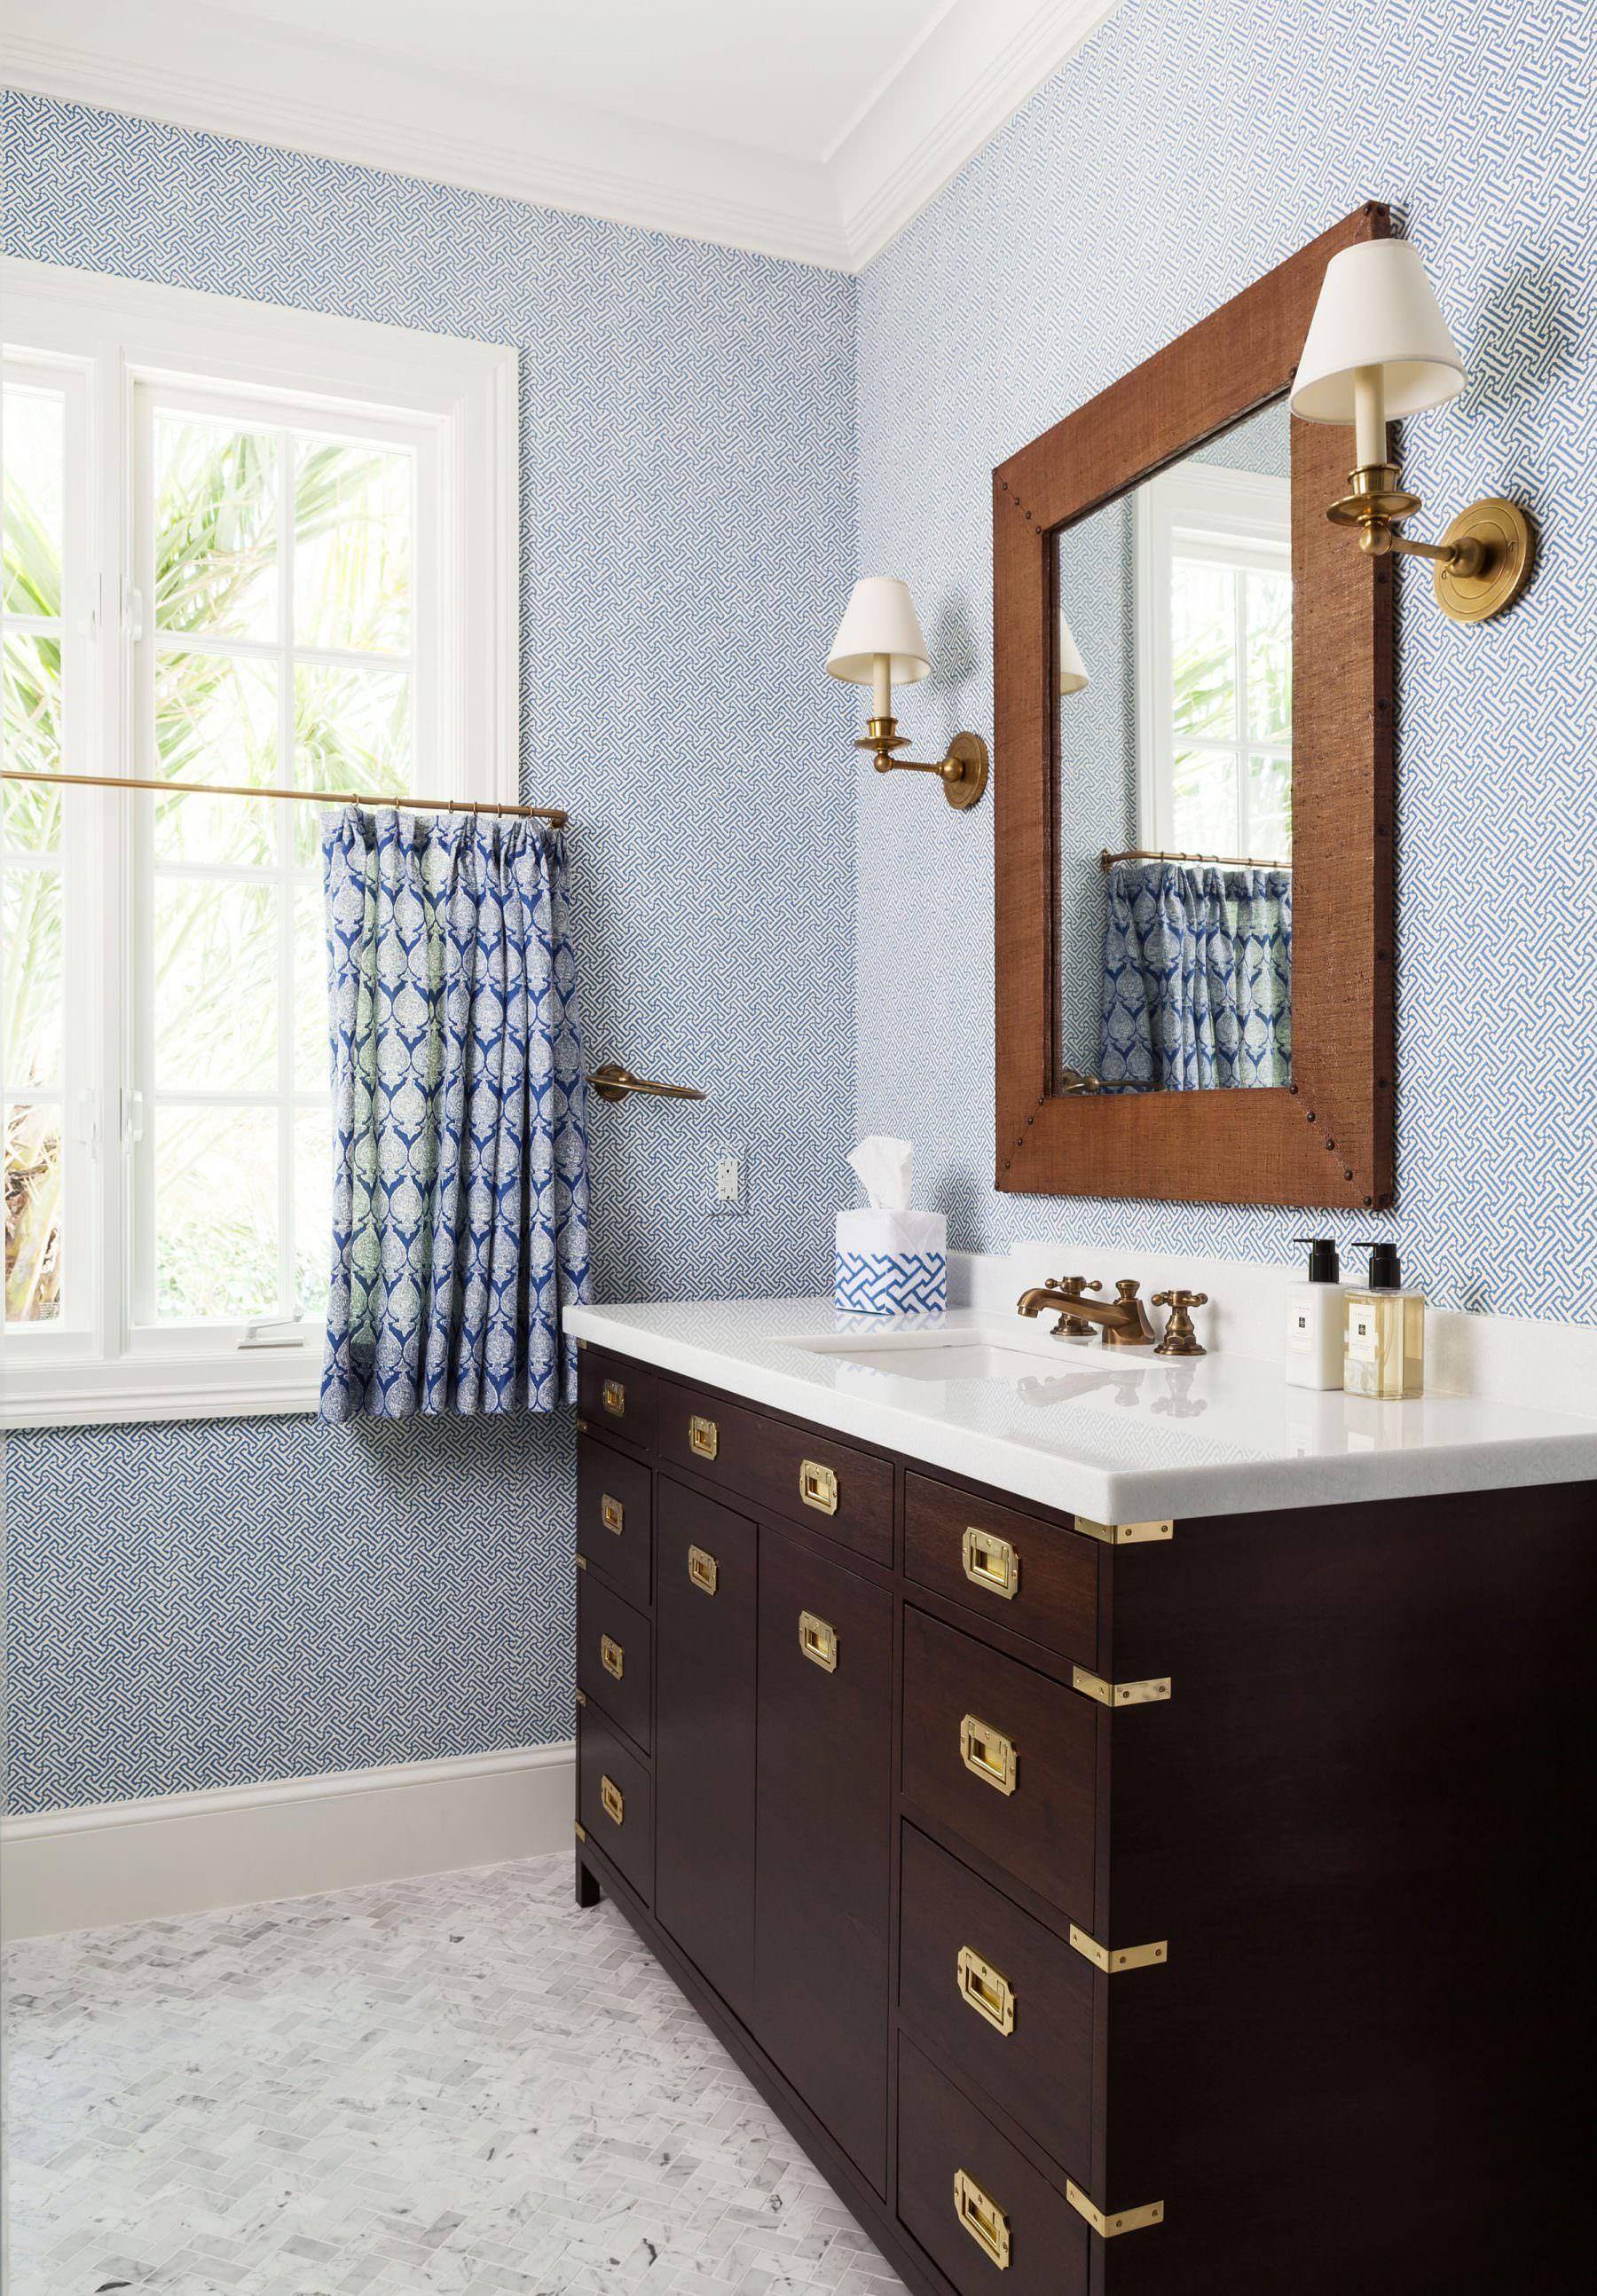 Campaign Style Vanity Brown Bathroom Decor Blue Bathroom Decor